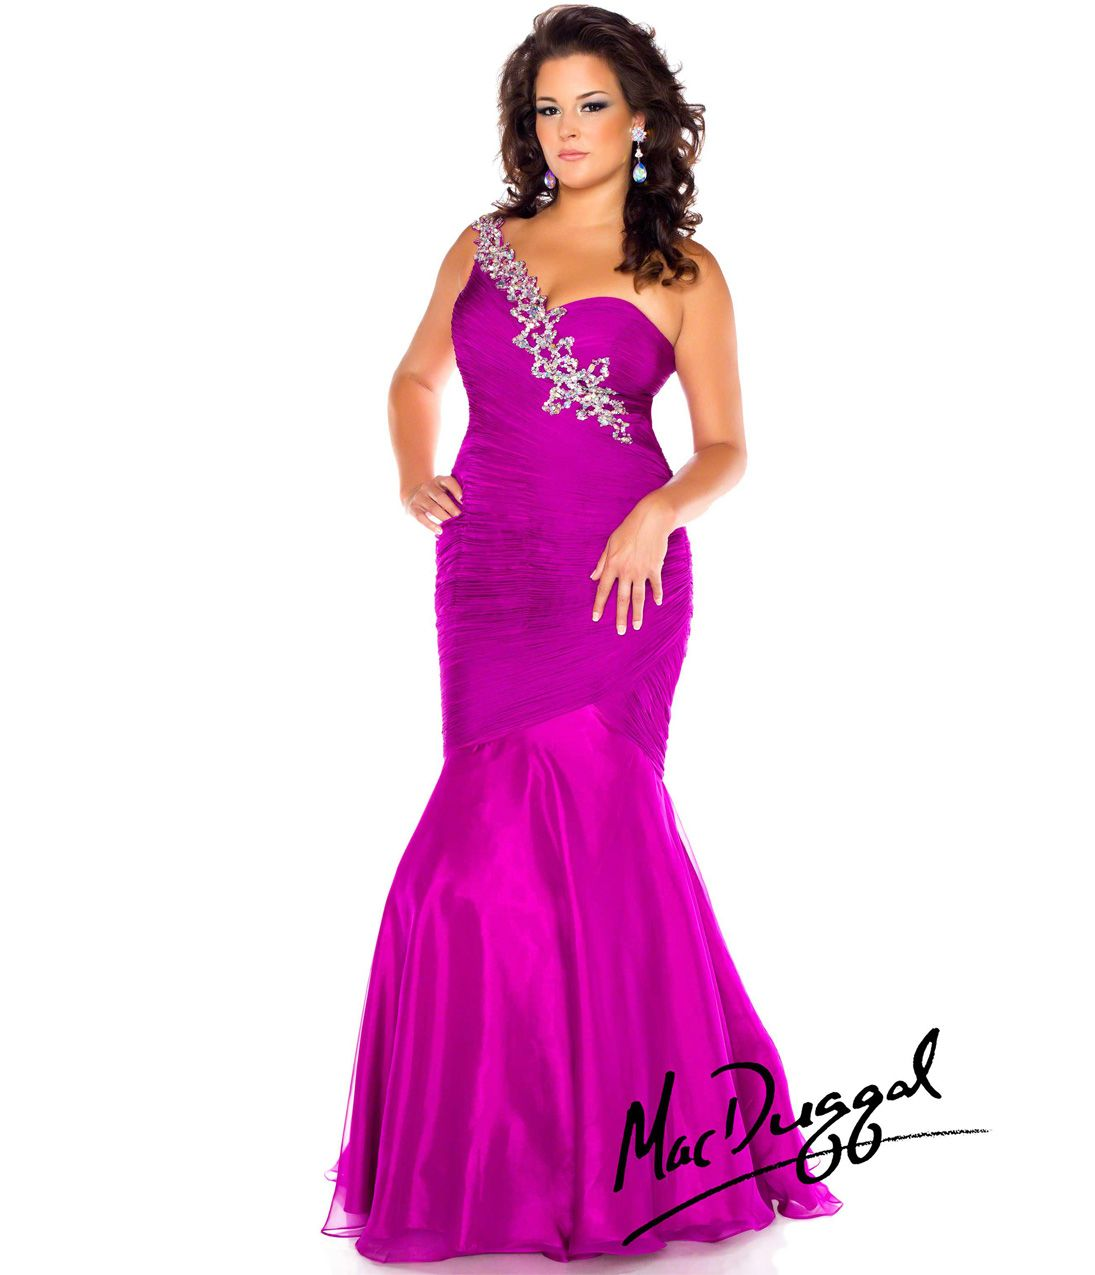 Mac Duggal 2014 Plus Size Prom Dresses - Magenta Crystal Chiffon ...